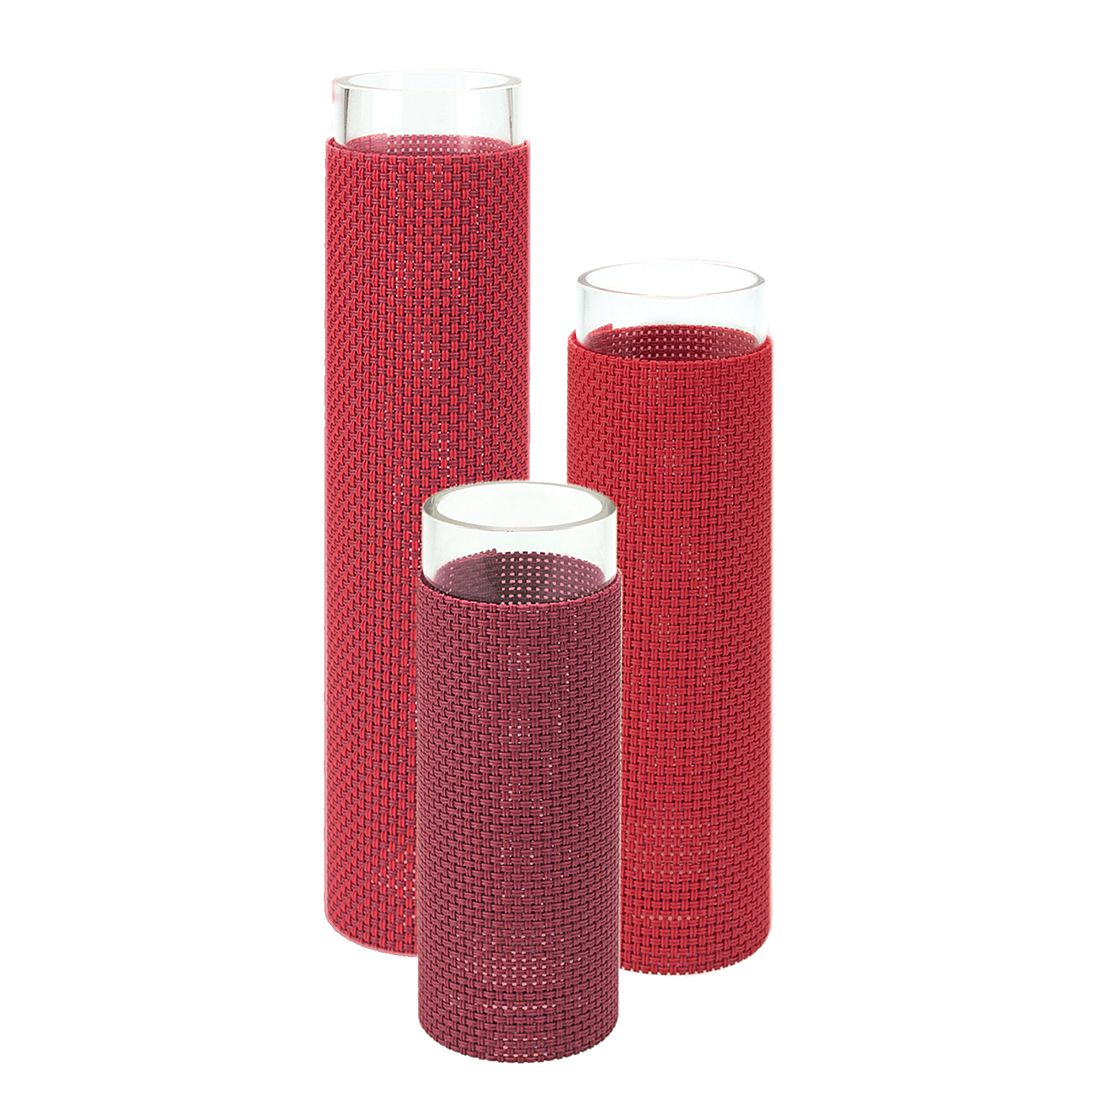 Blumenvase Florah (3er-Set) – Klarglas/Kunststoff Rot, Contento günstig bestellen